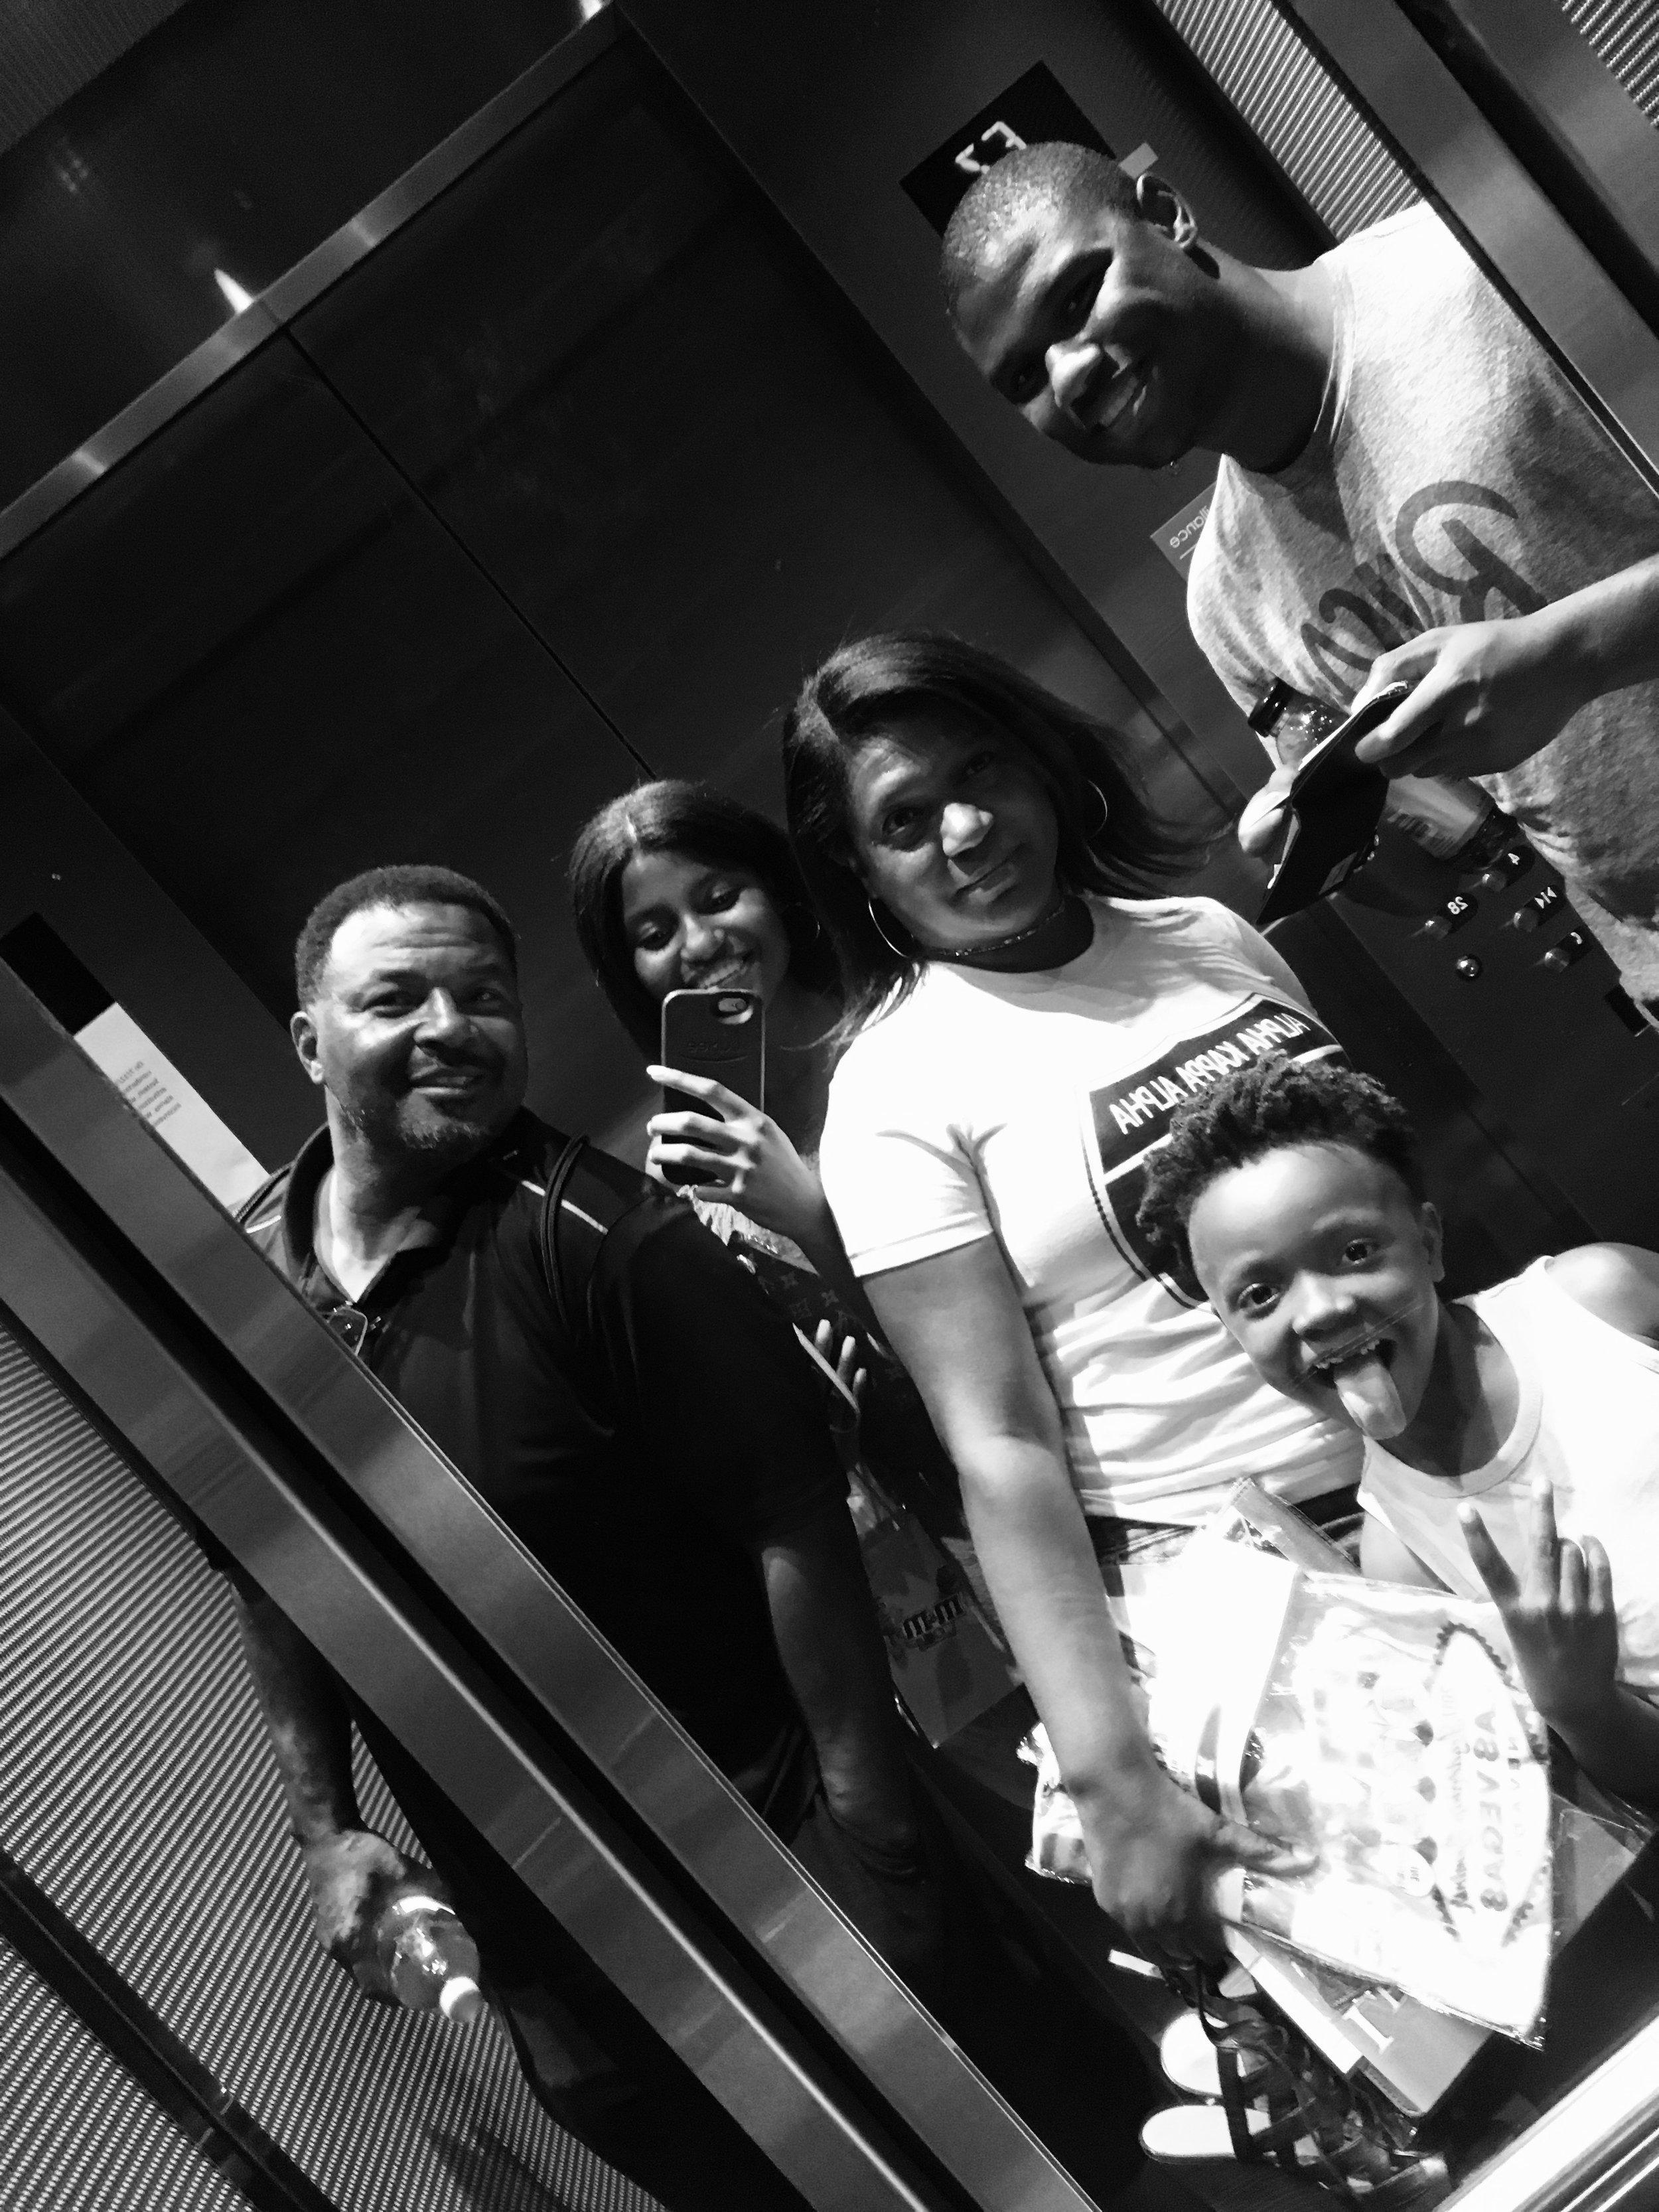 Love my crazy family. Till Next Time Vegas!